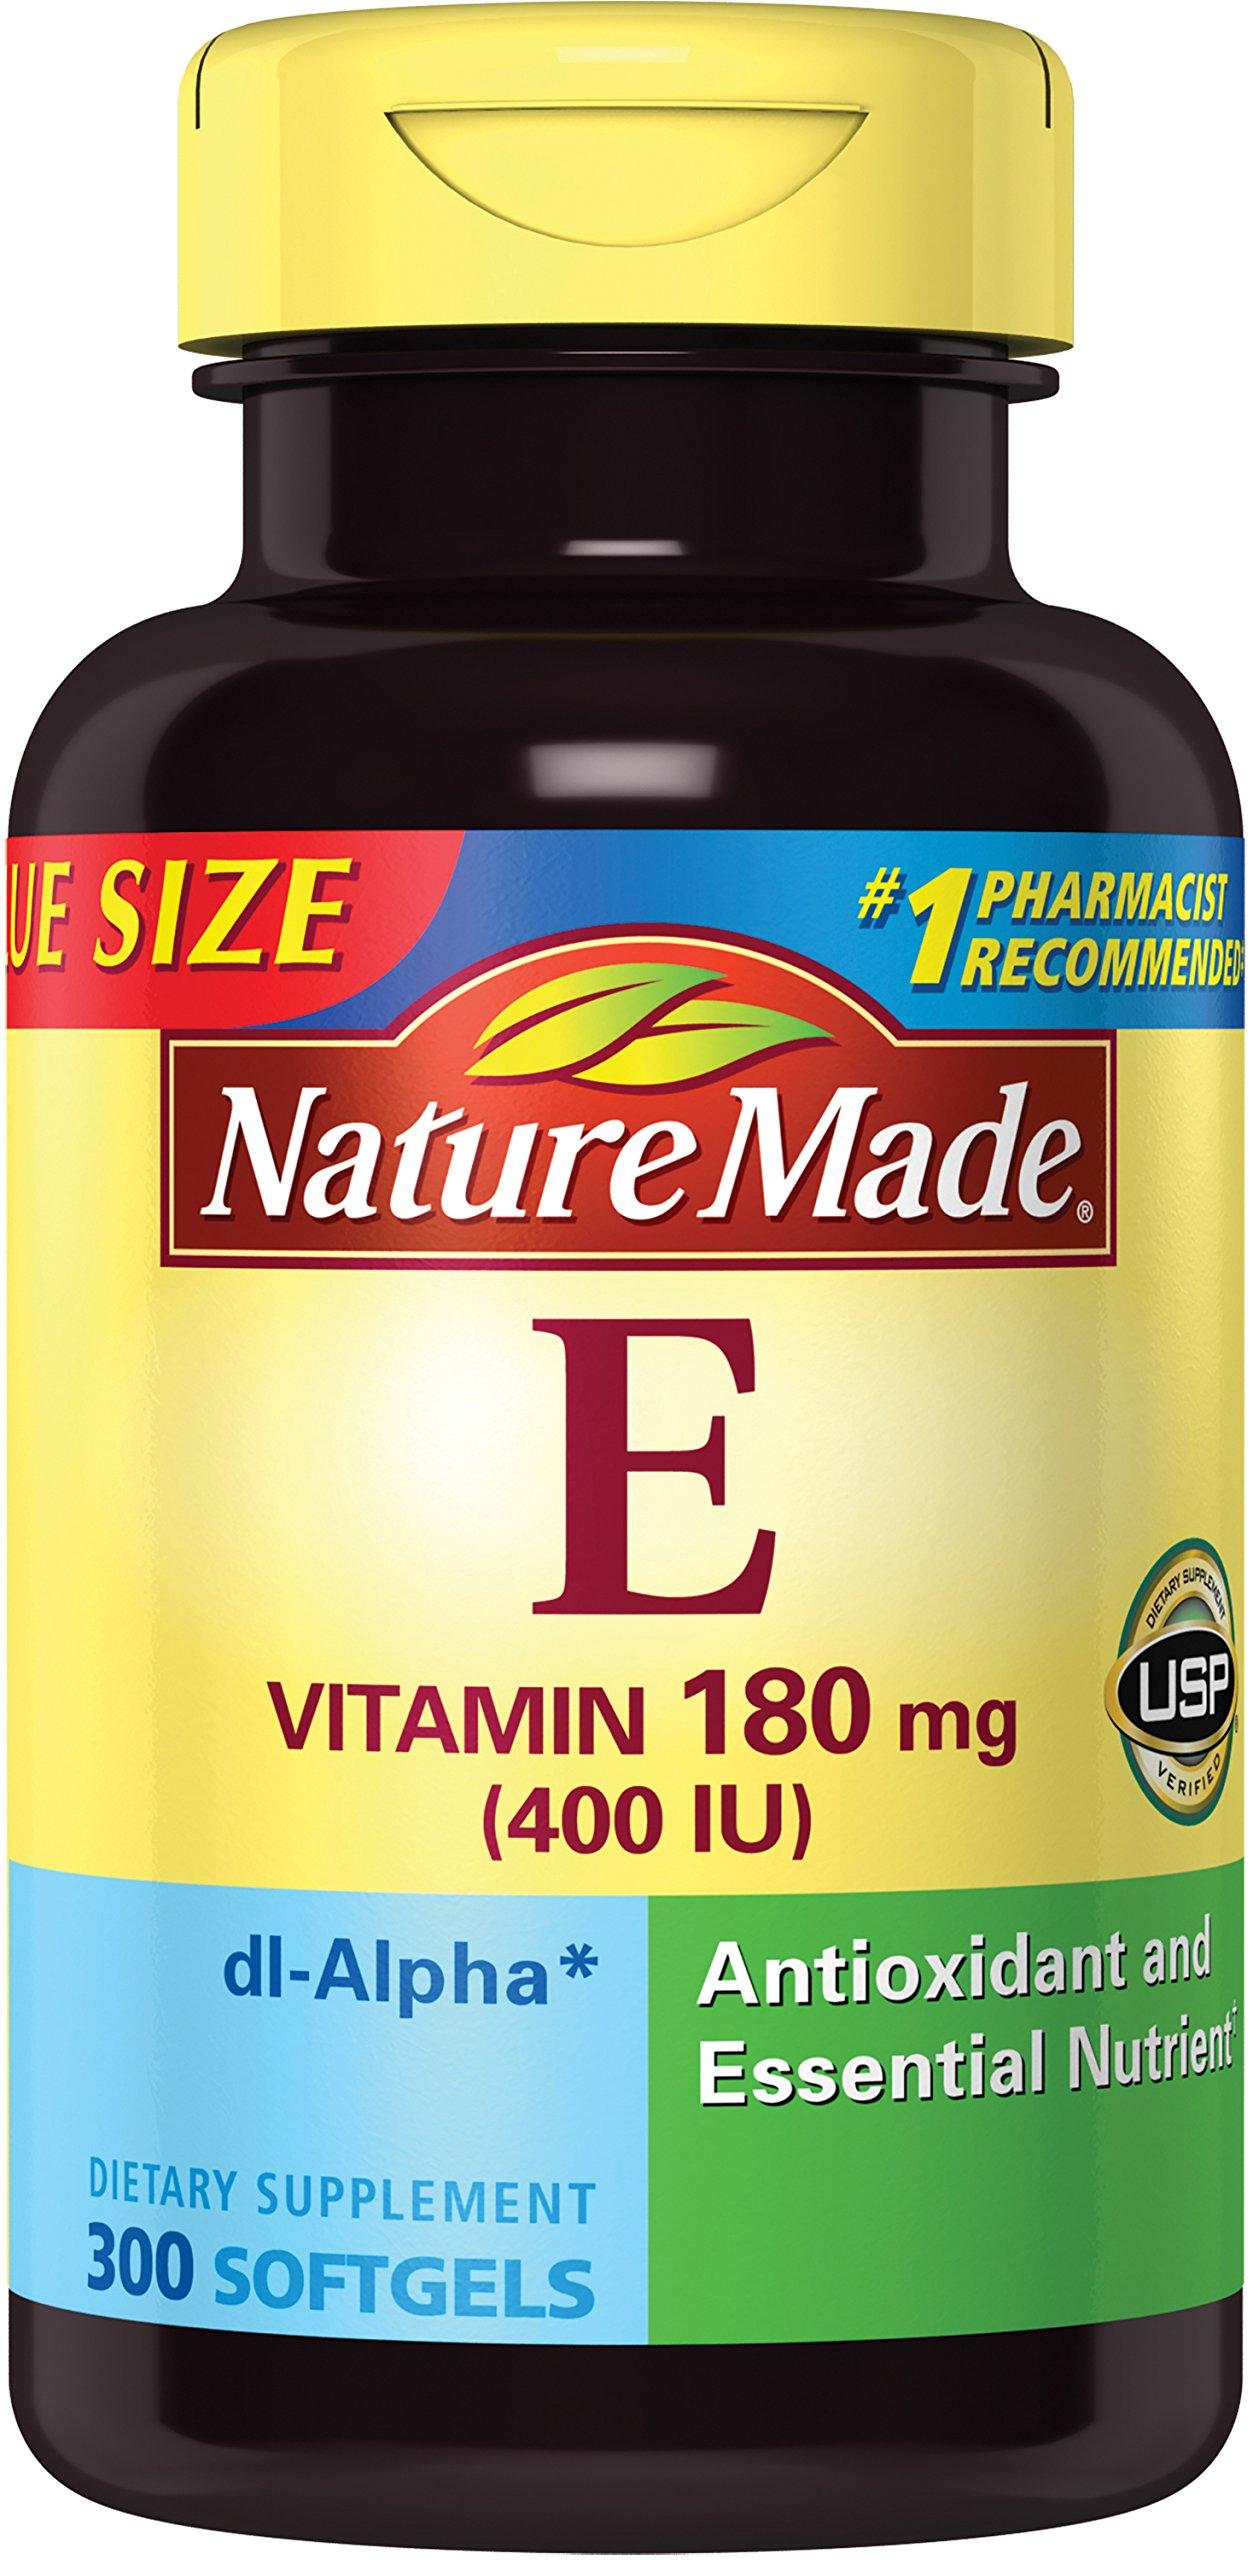 Nature Made Vitamin E 400 IU Softgels, 300 ct